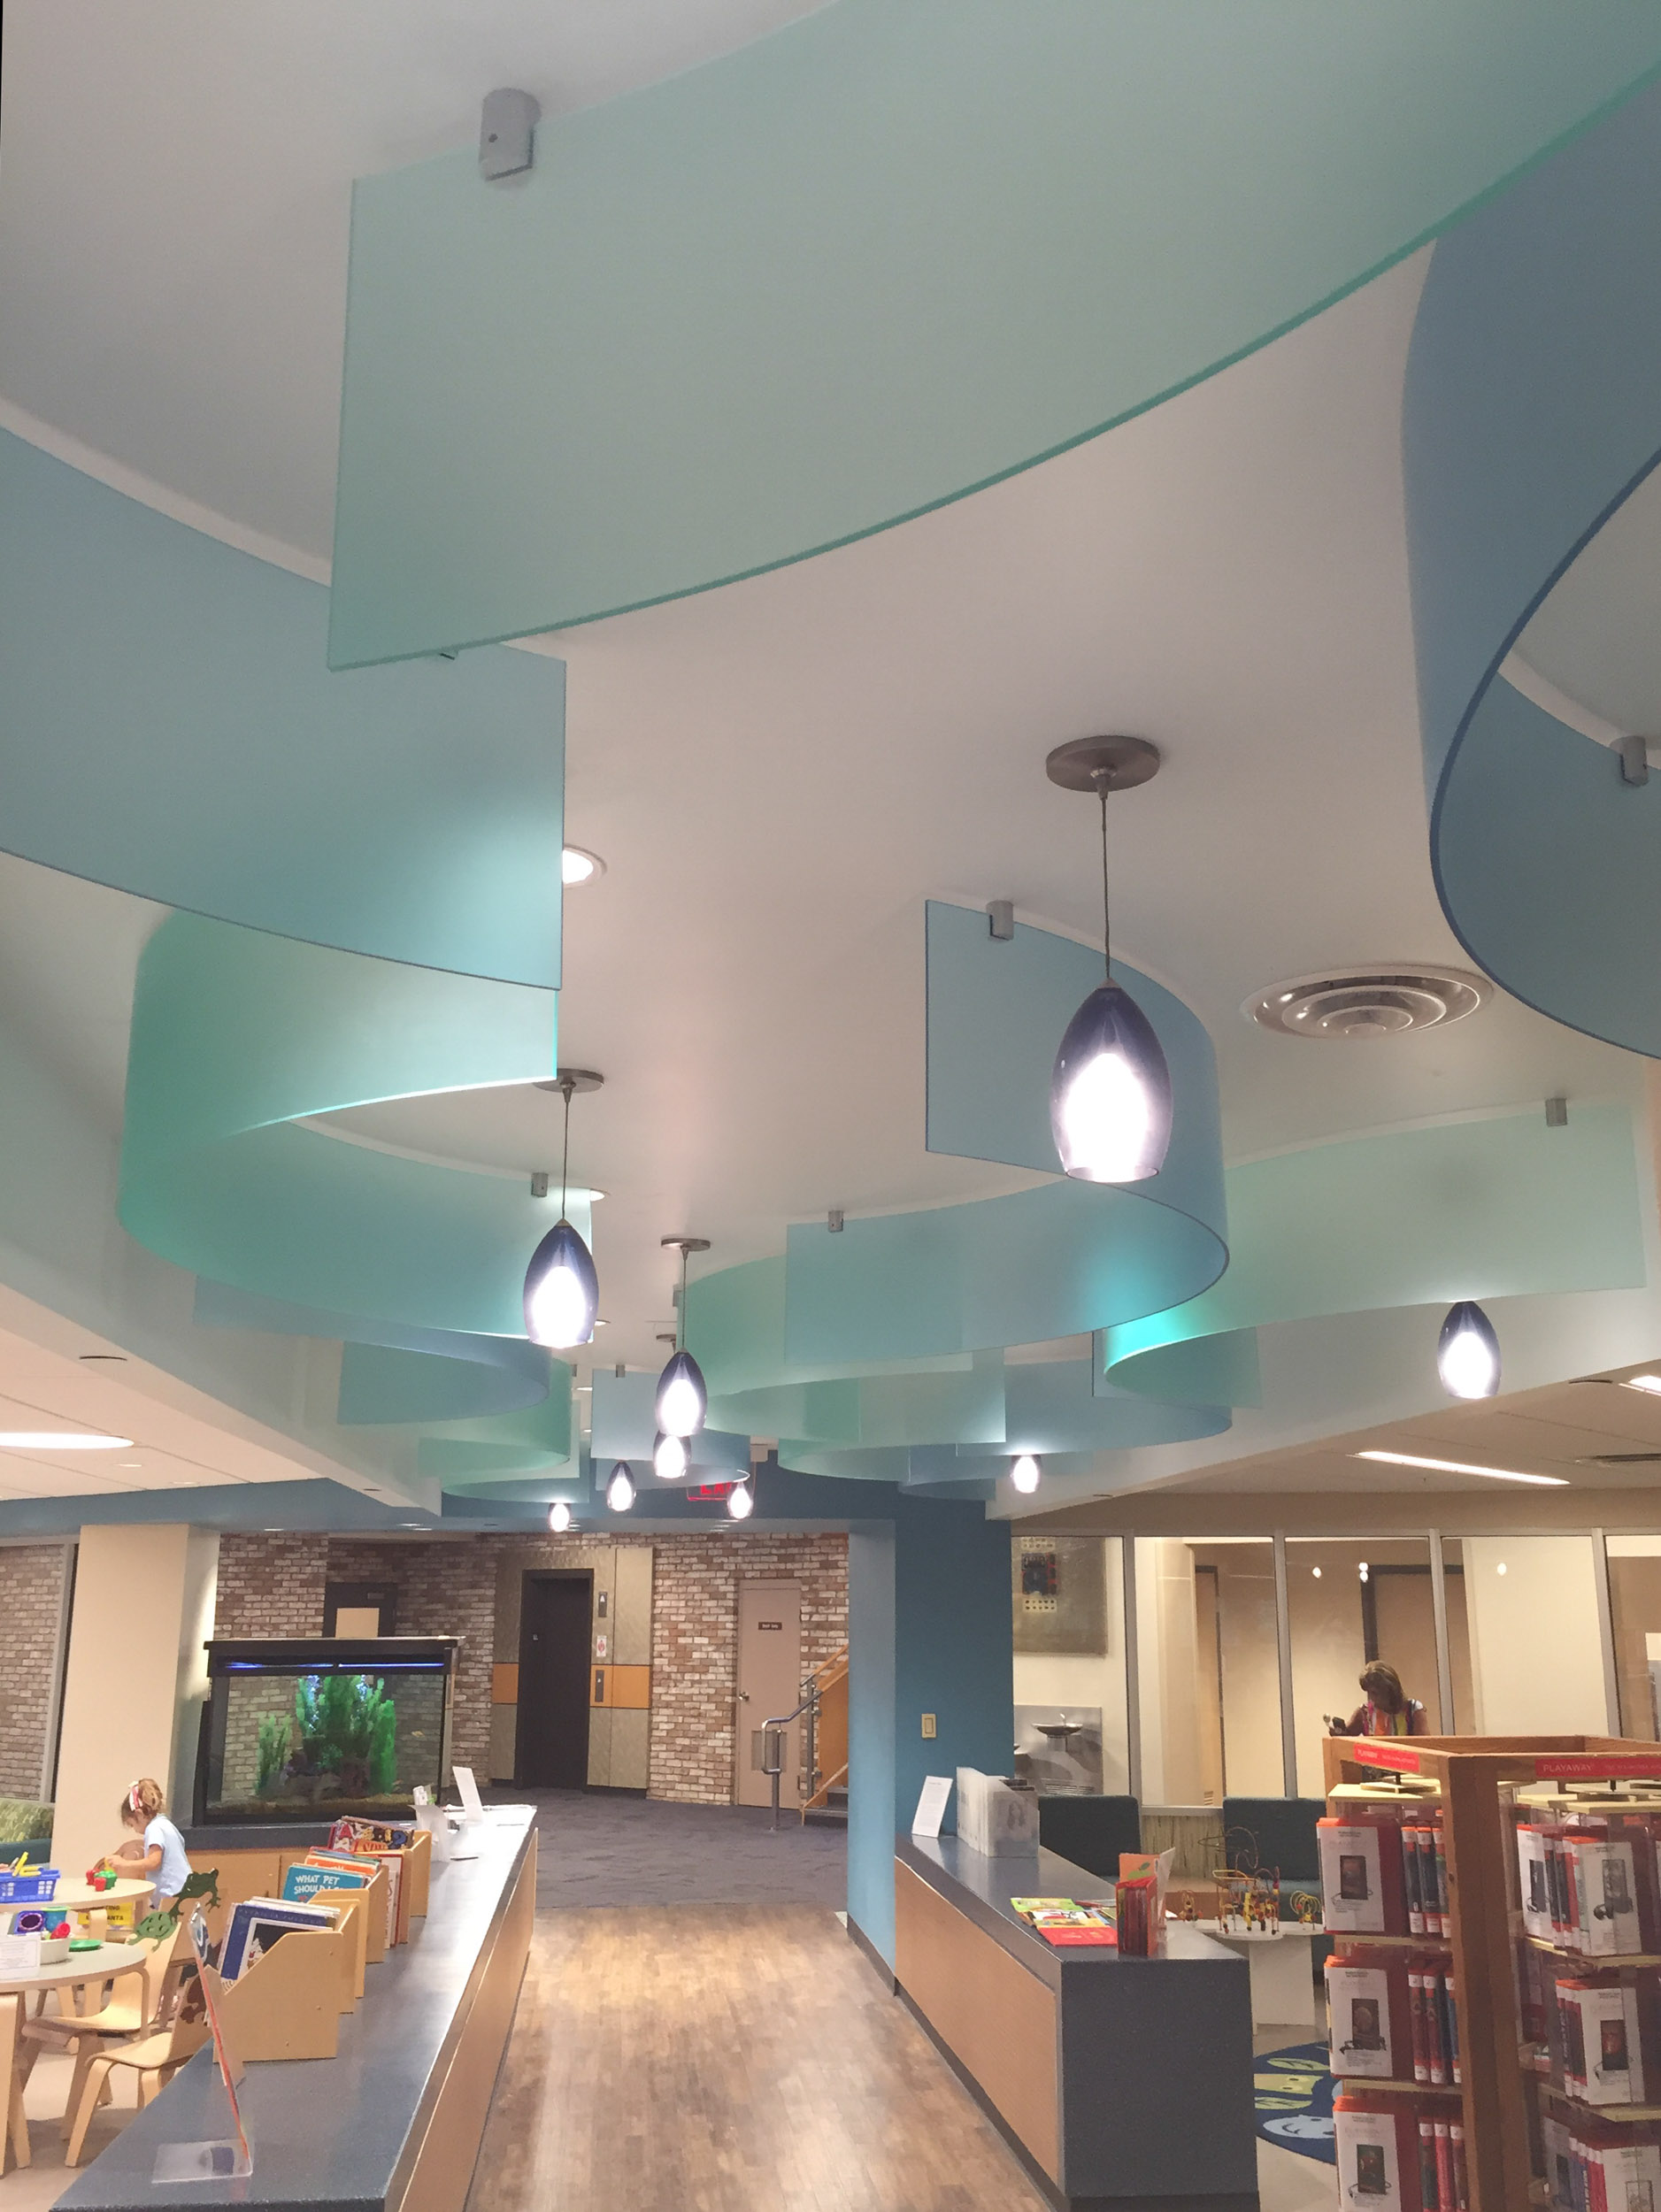 Lumicor Lighting Lighting Ideas Interiors Inside Ideas Interiors design about Everything [magnanprojects.com]